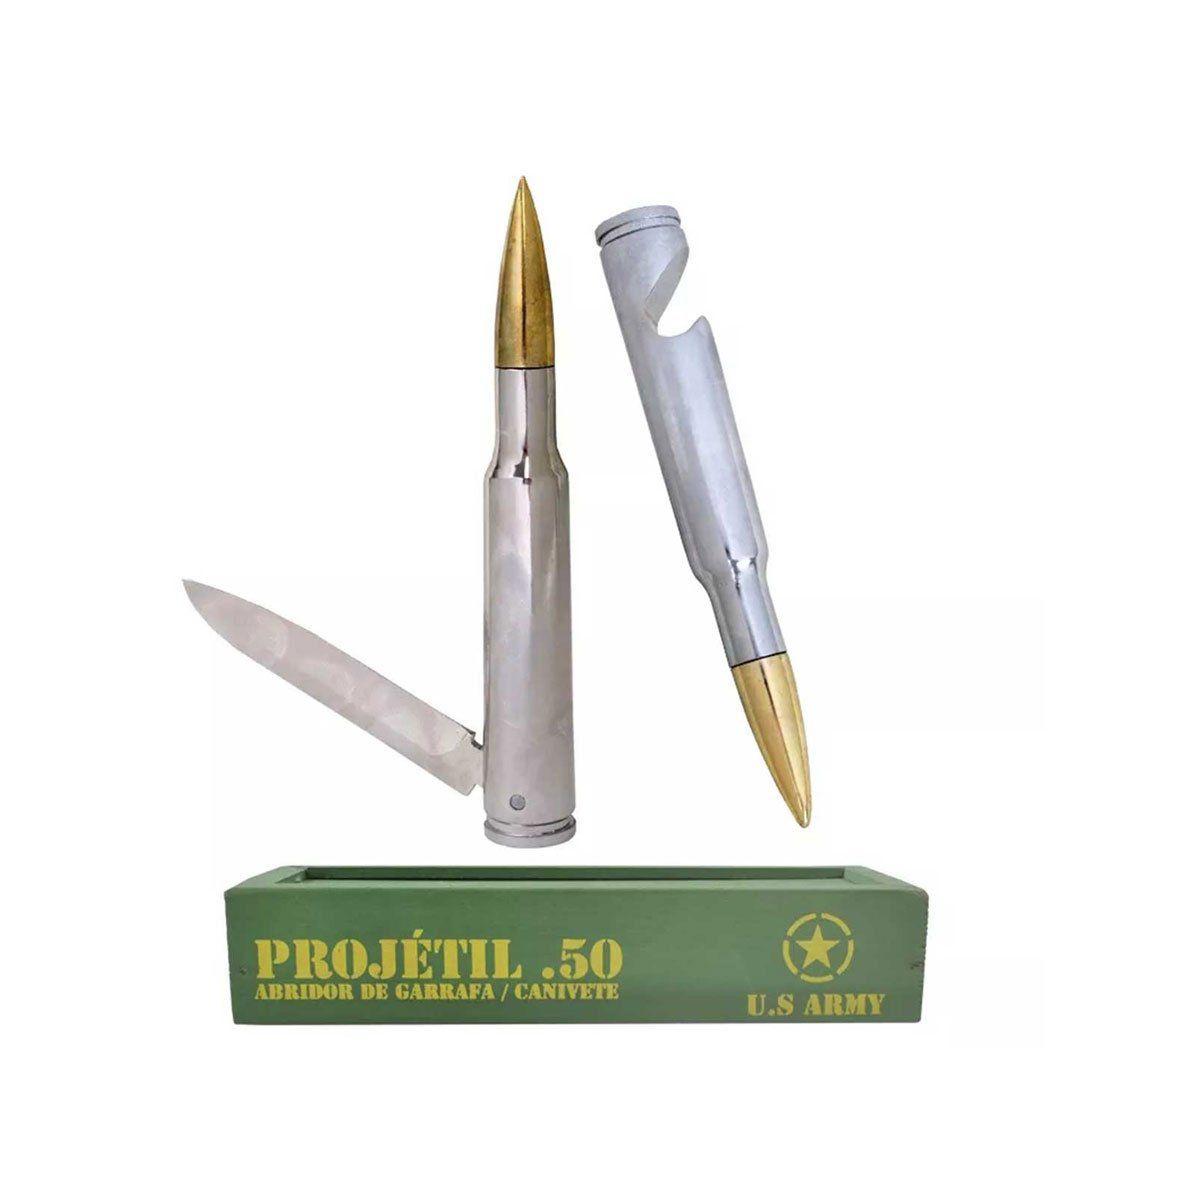 Kit Abridor de Garrafa e Canivete Projetil .50 Bélica